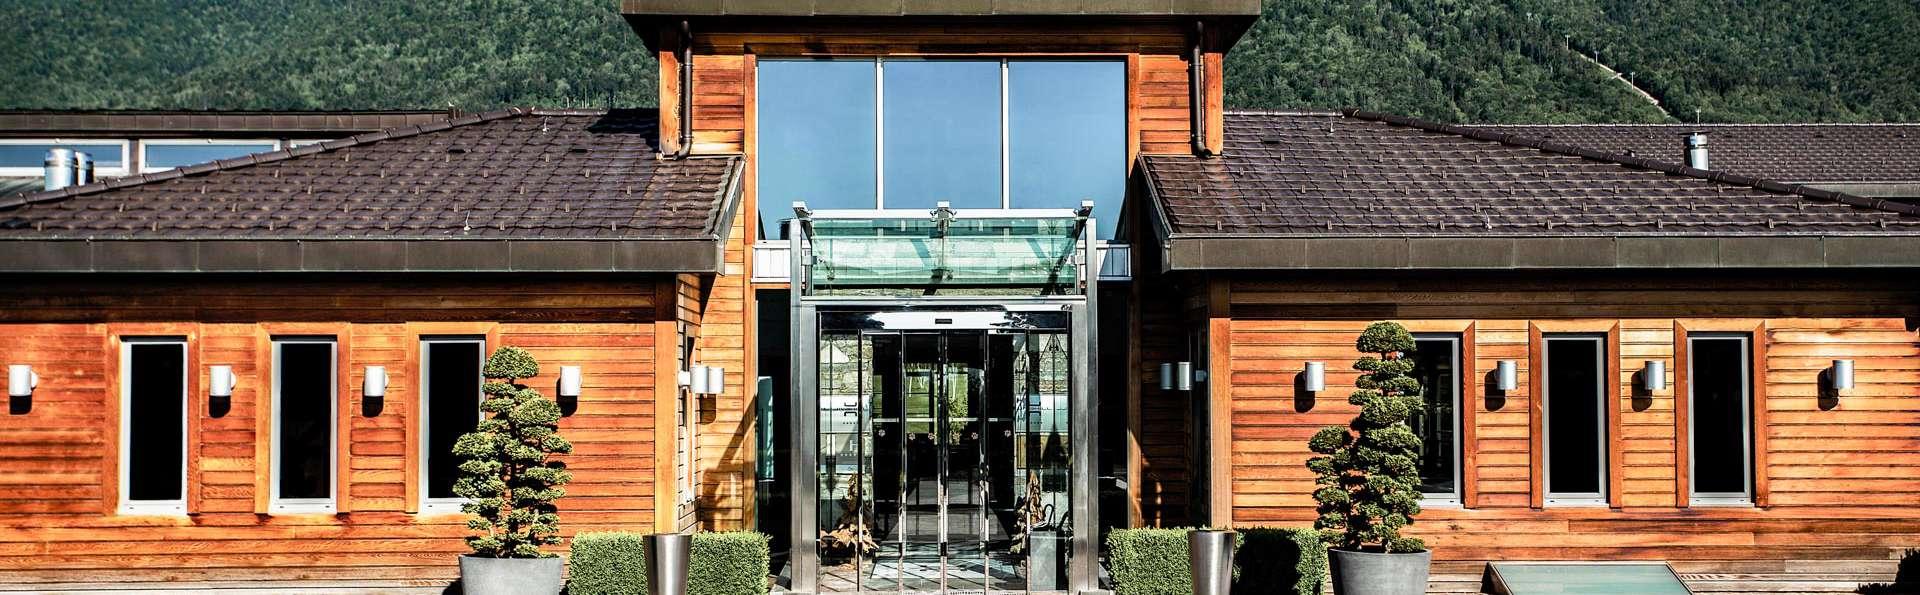 Jiva Hill Resort - EDIT_FRONT_02.jpg